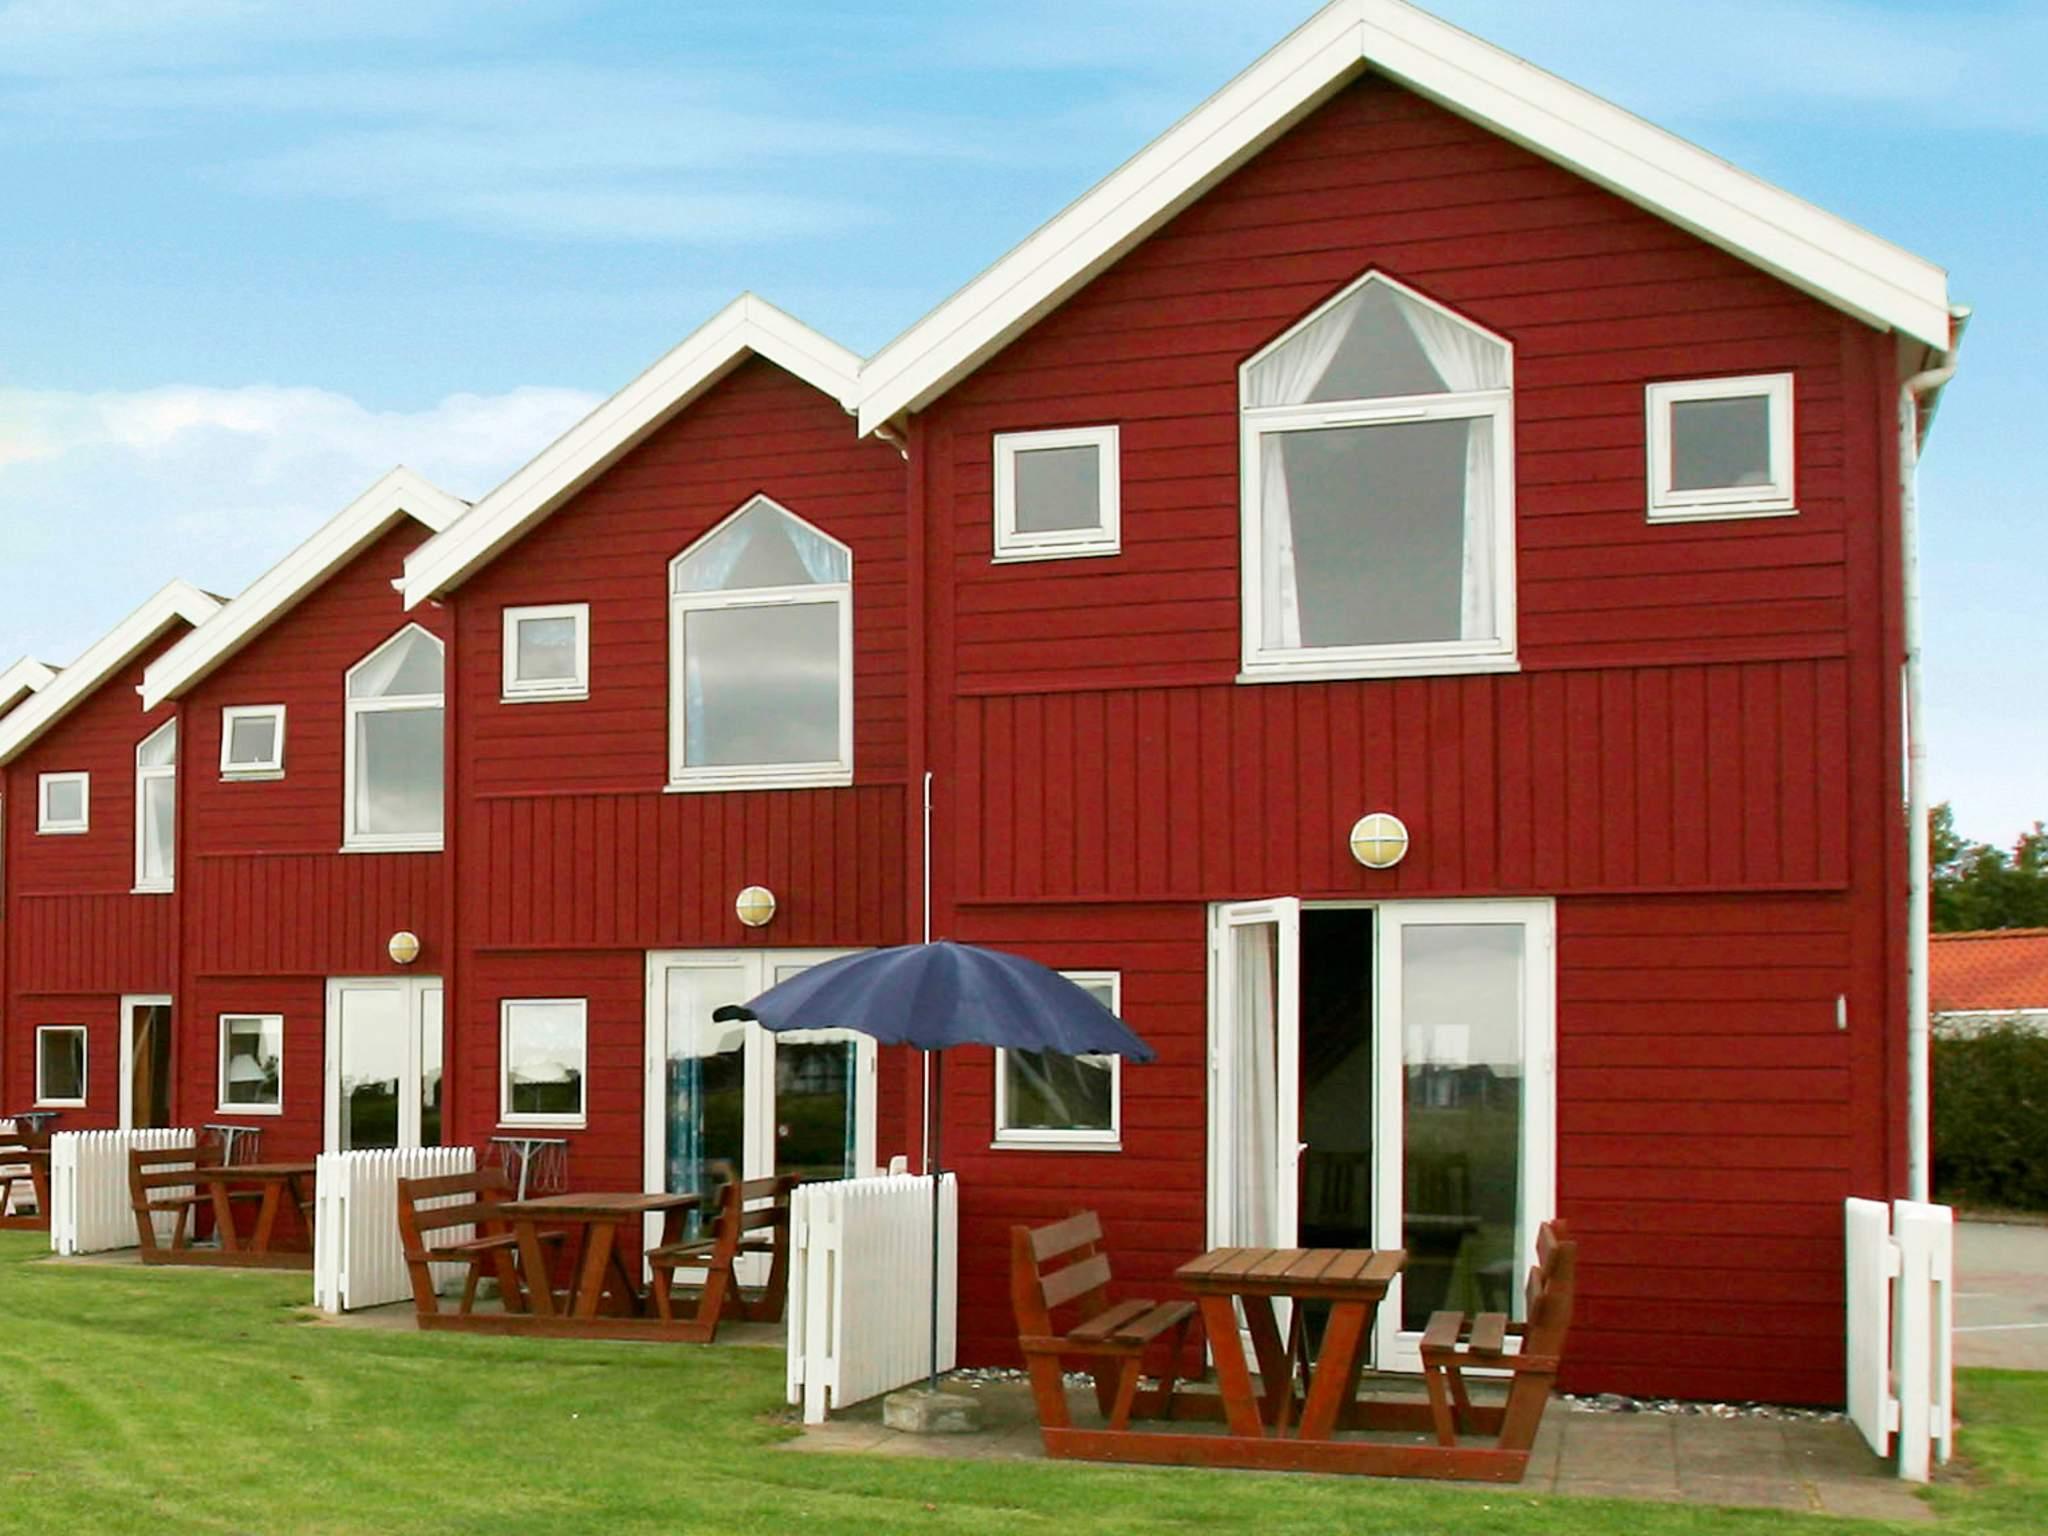 Ferienwohnung Øster Hurup (377970), Øster Hurup, , Ostjütland, Dänemark, Bild 1